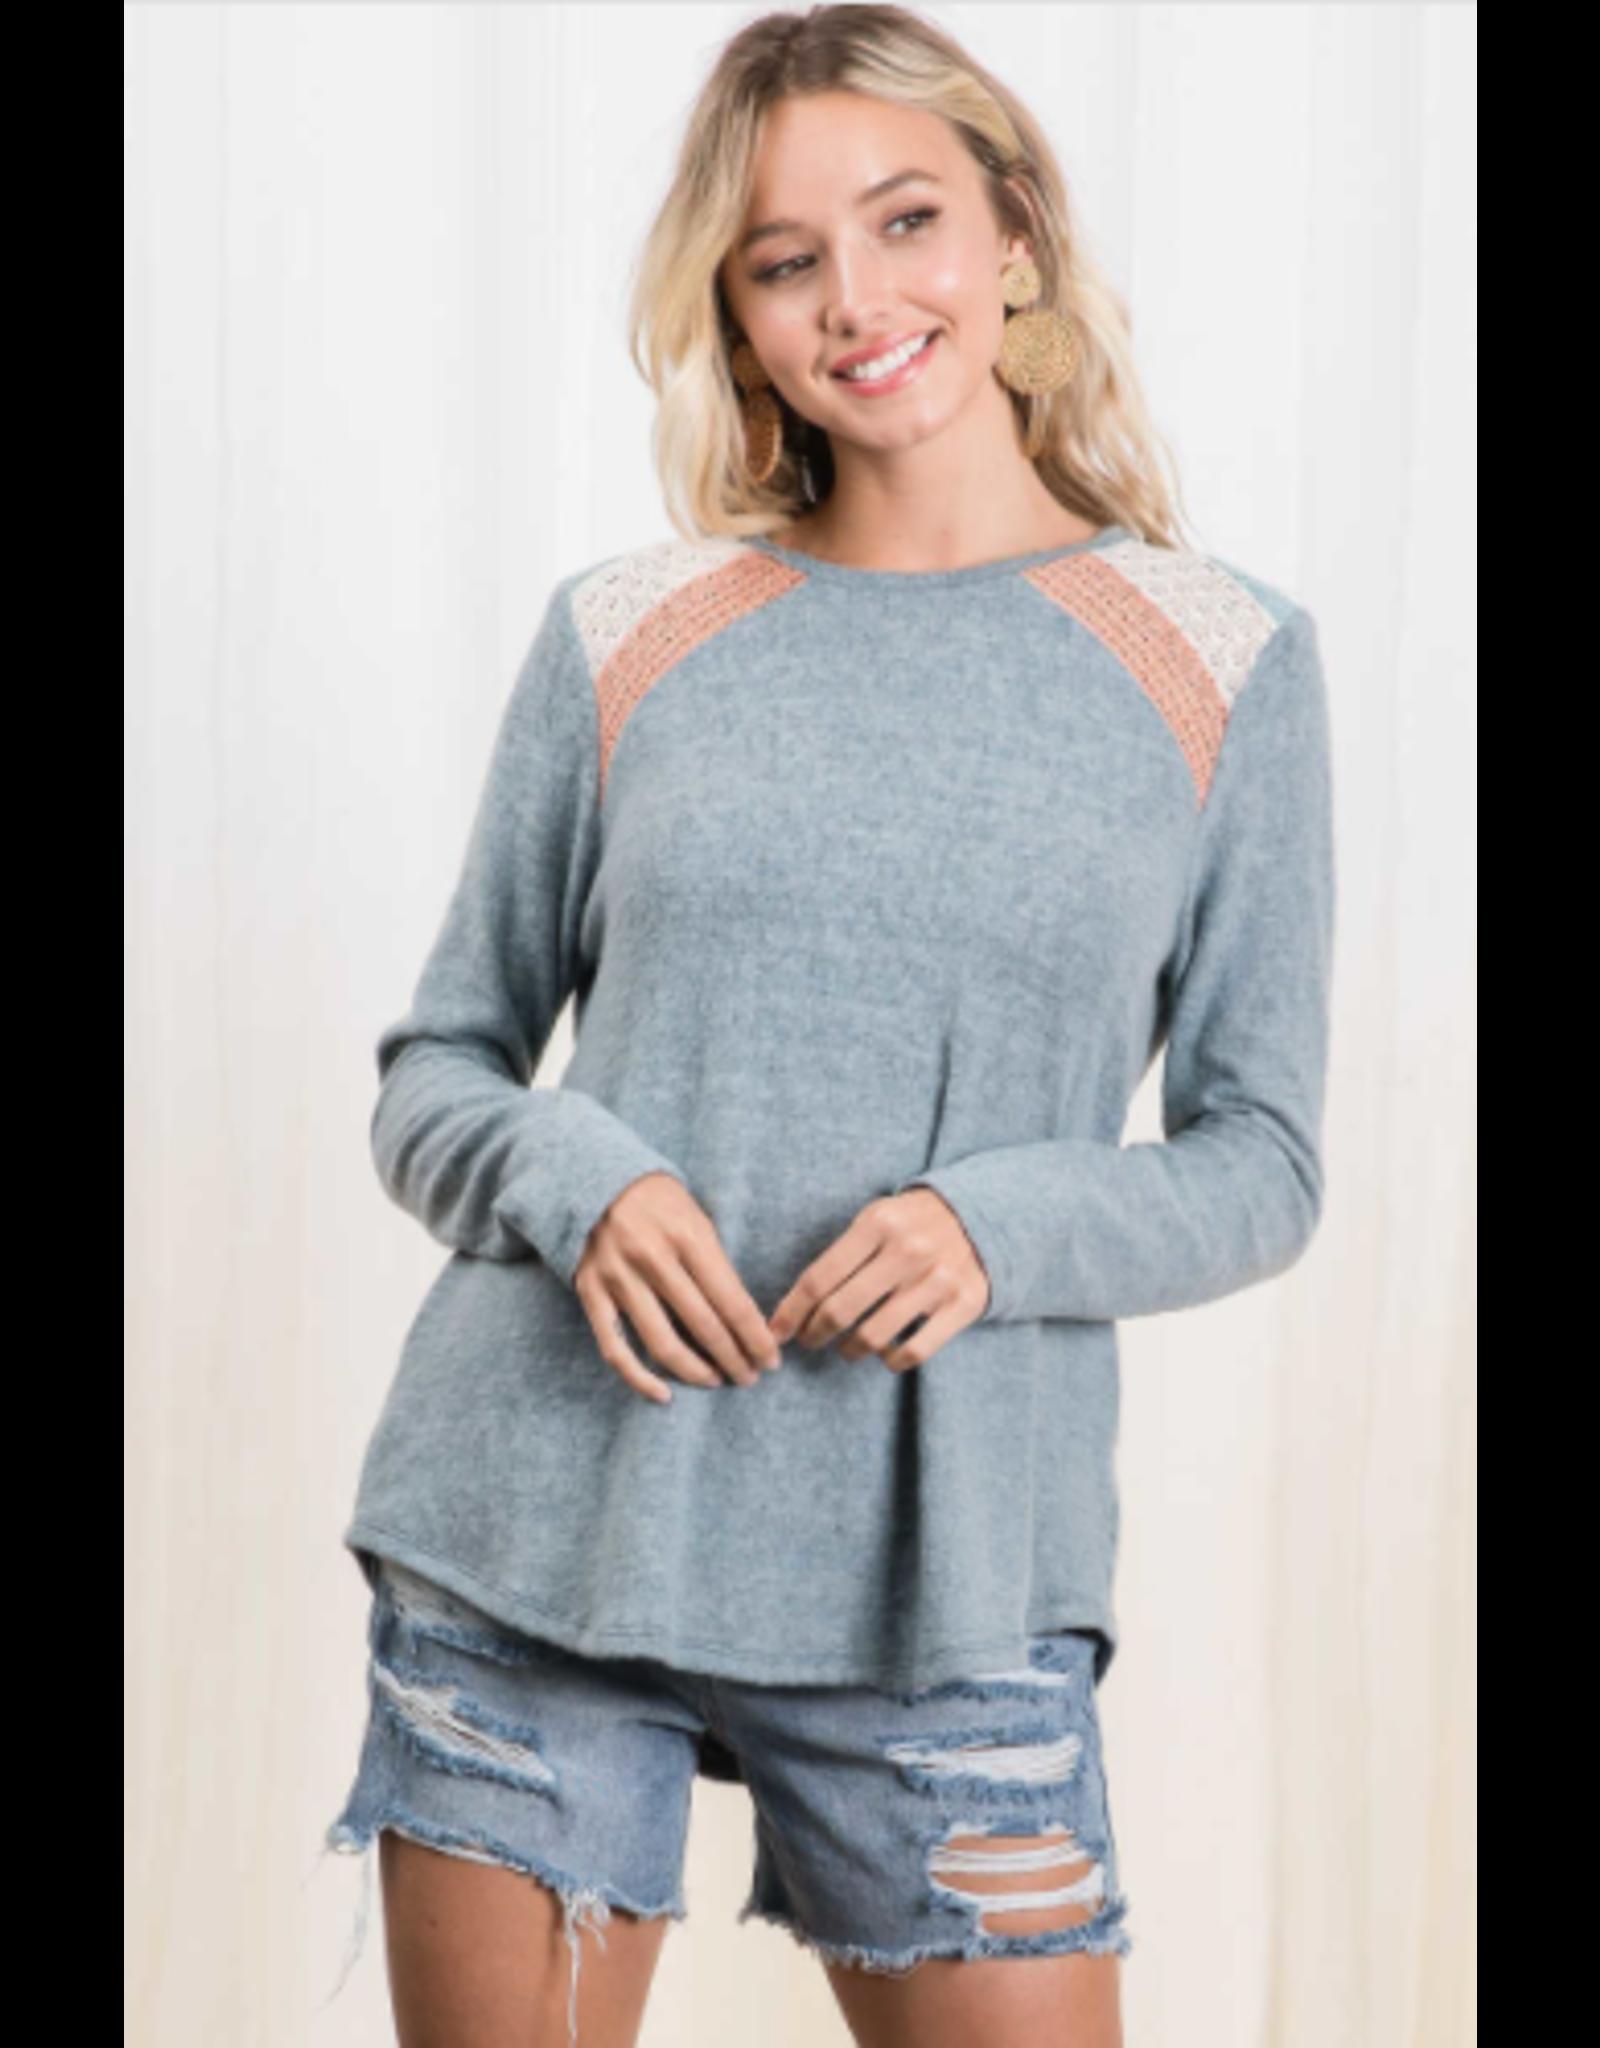 Wren - Brushed knit top with colour block shoulder detail (mint)